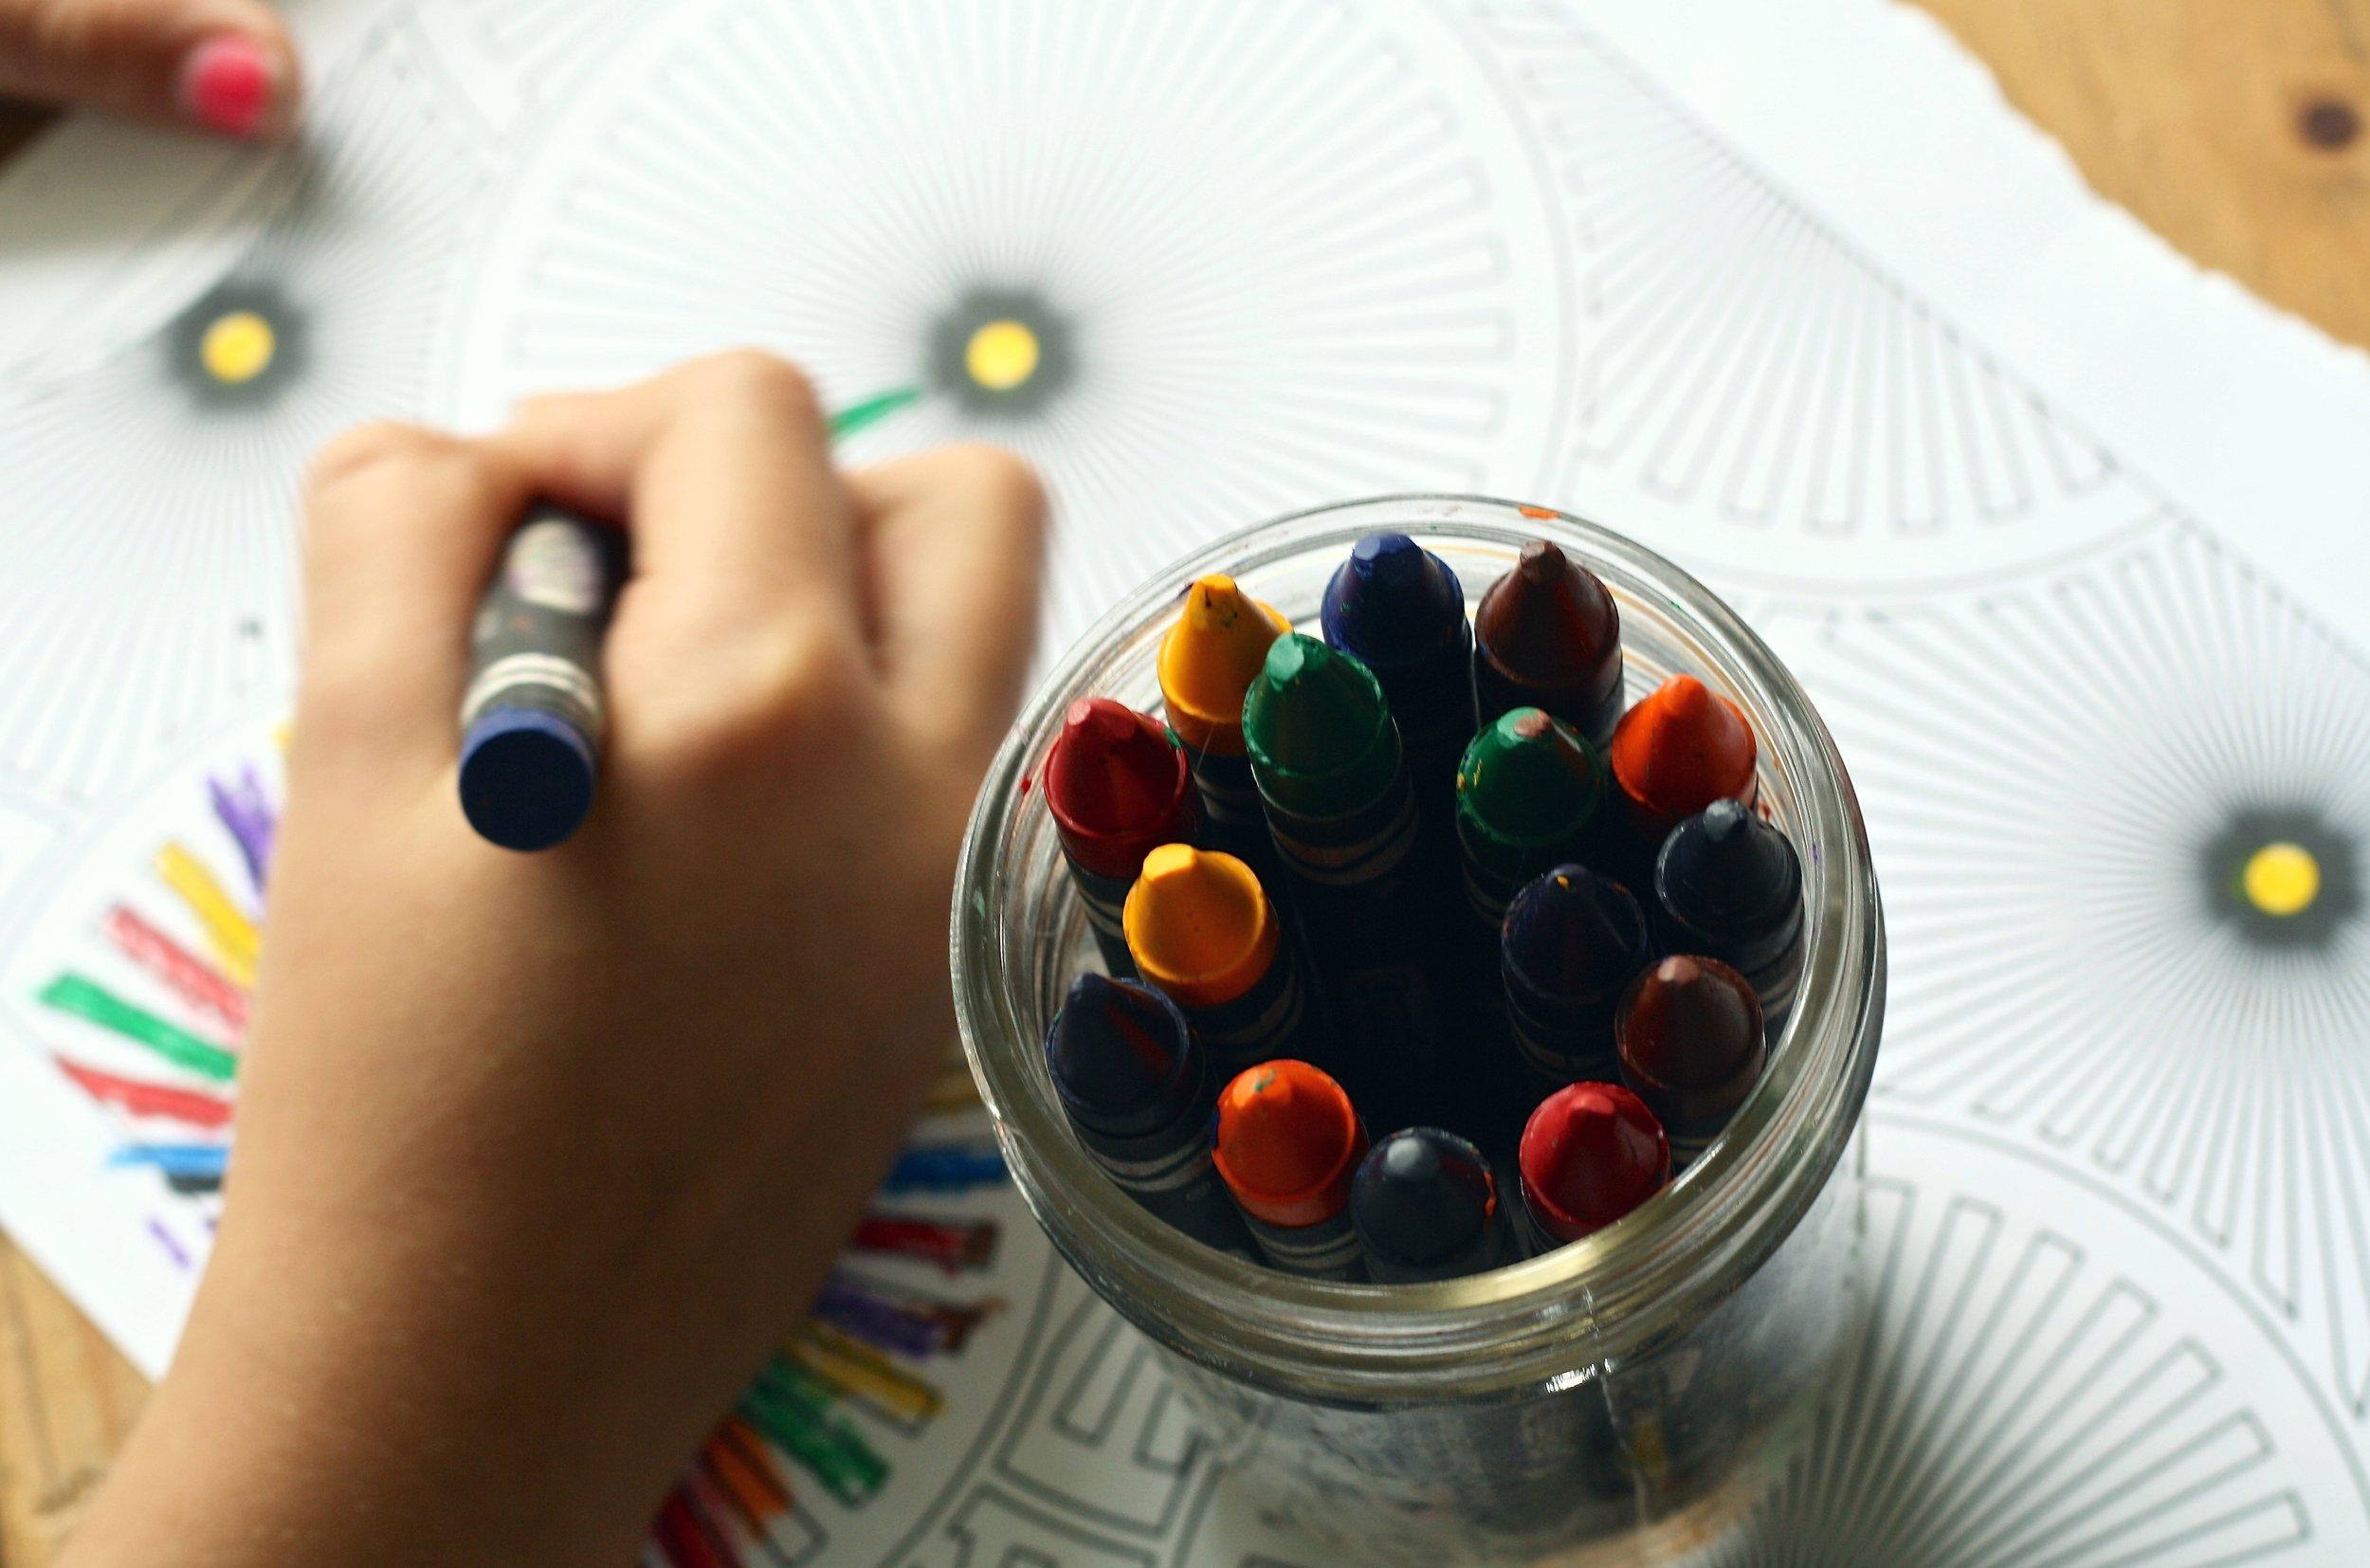 crayon little hands coloring